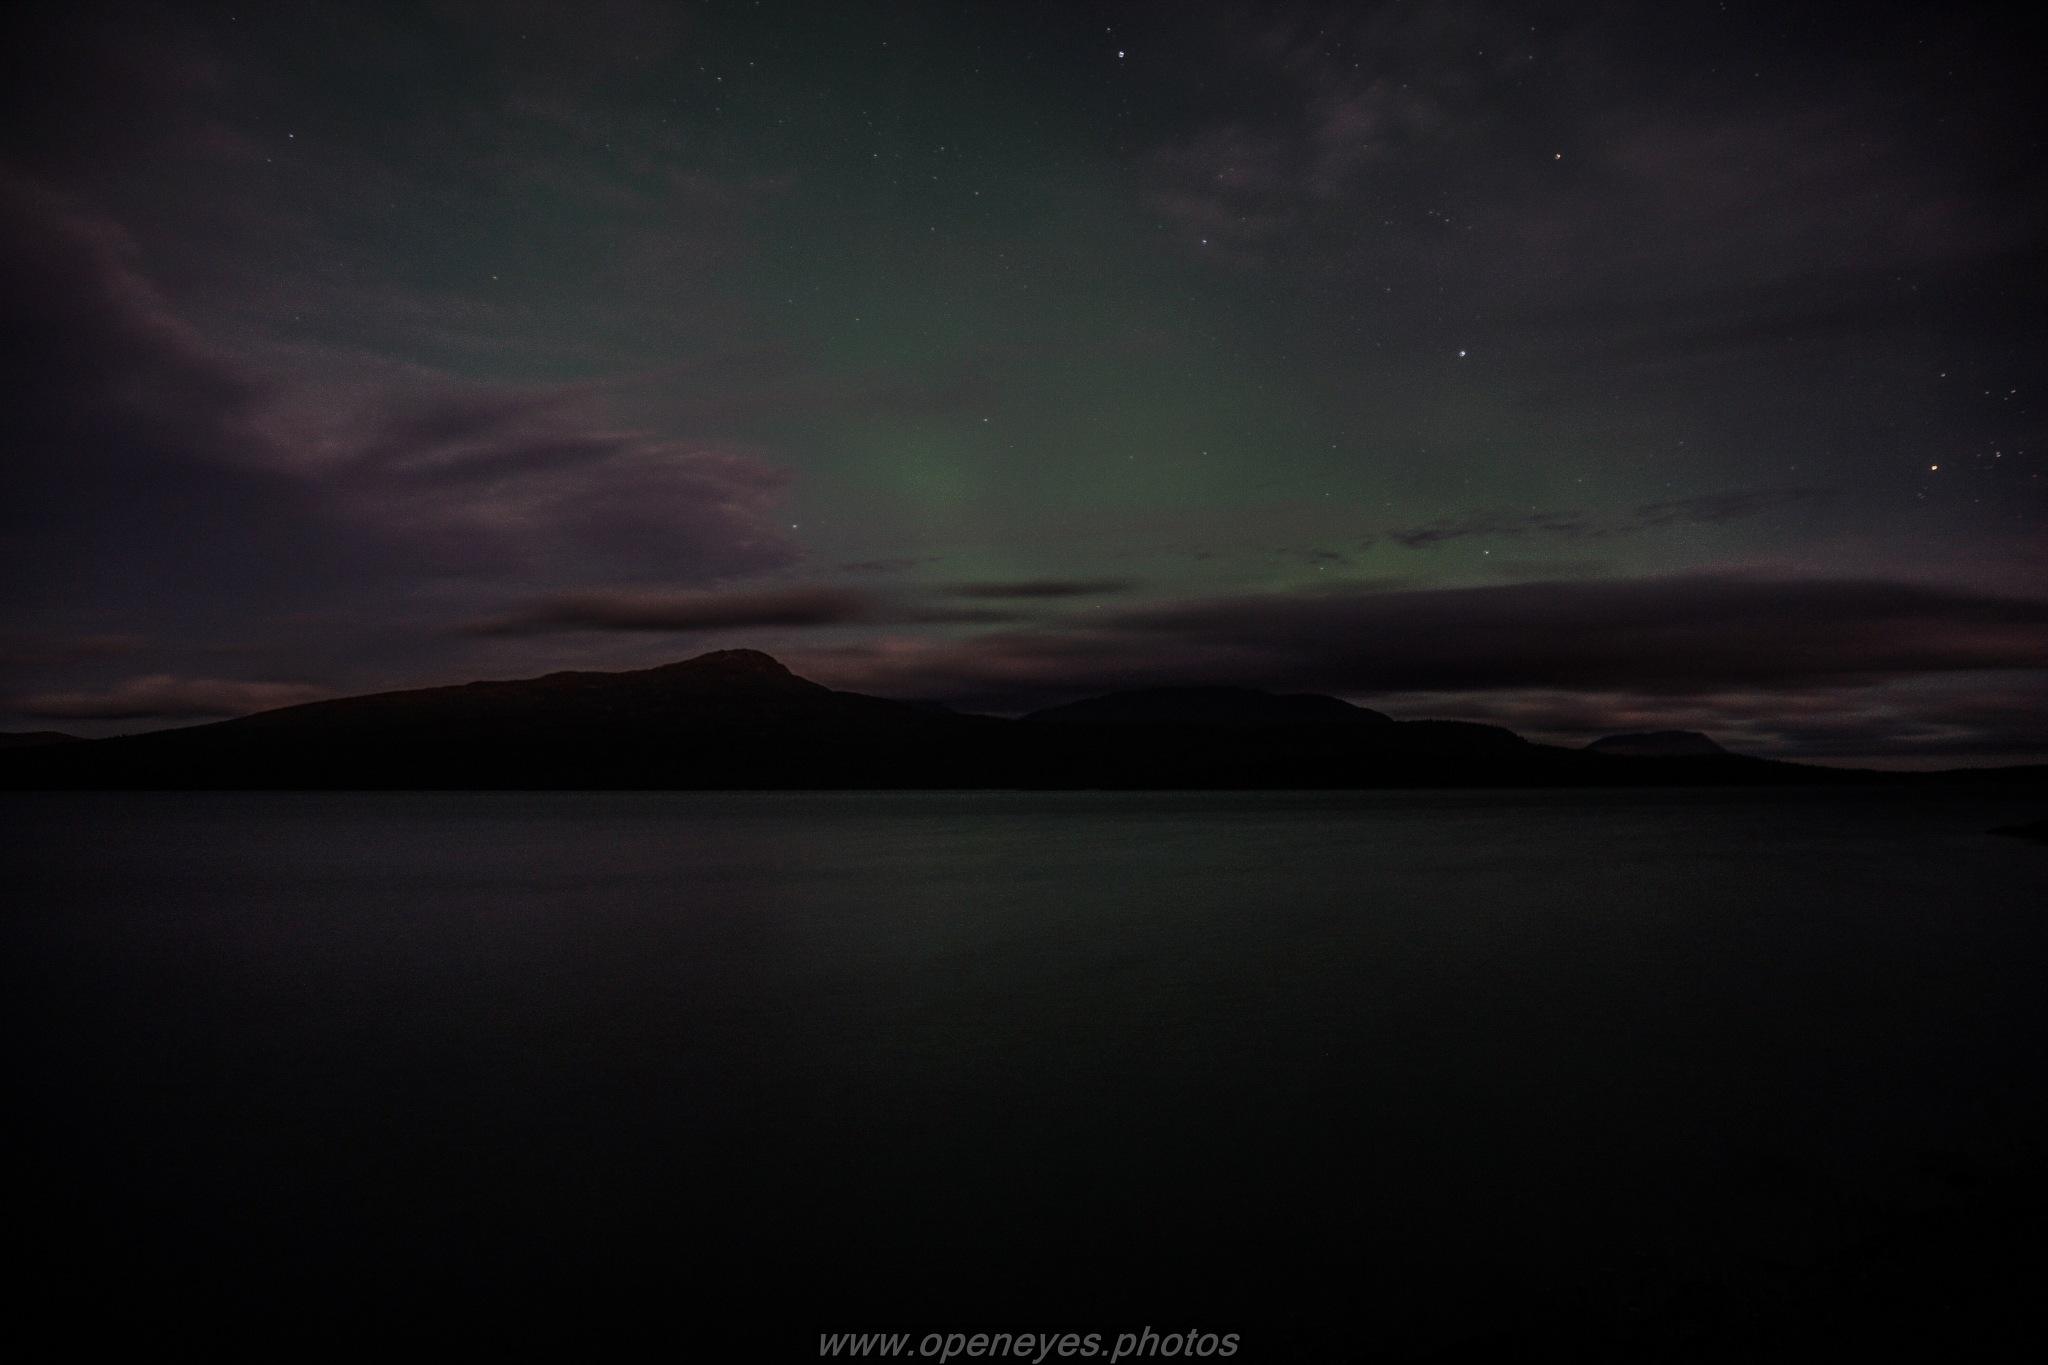 Gentle Glowing by Alexander Conrad